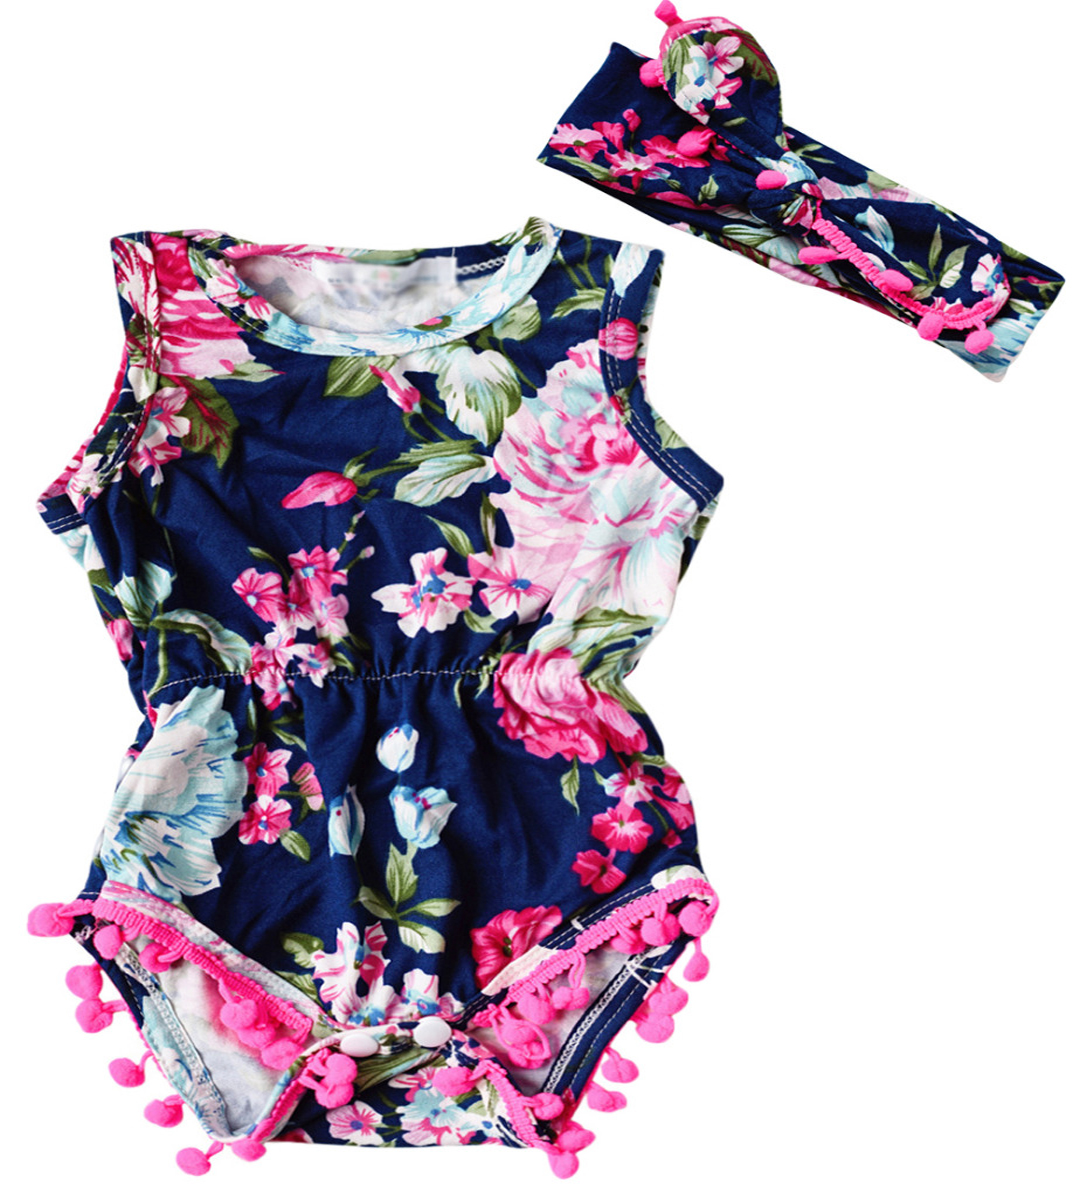 Hot Infant Baby Girls Sleeveless Silk  Body Romper Jumpsuit Summer Sunsuit Floral Clothes Set 0--24M